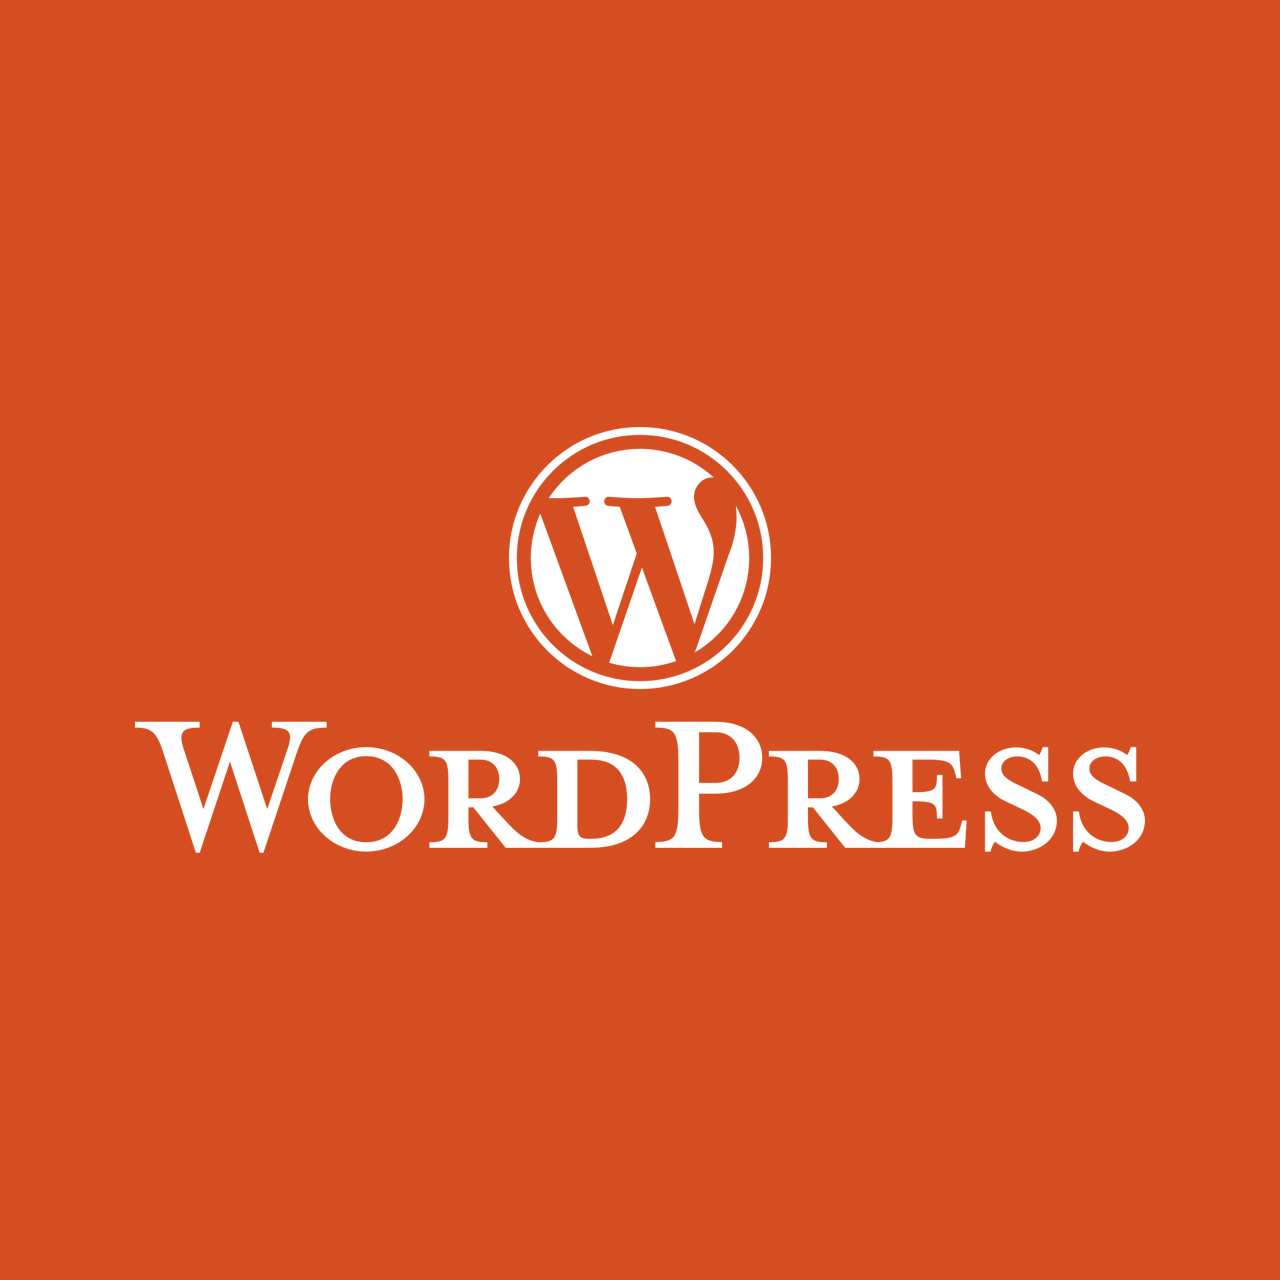 《WordPress》jQueryを使う時の問題